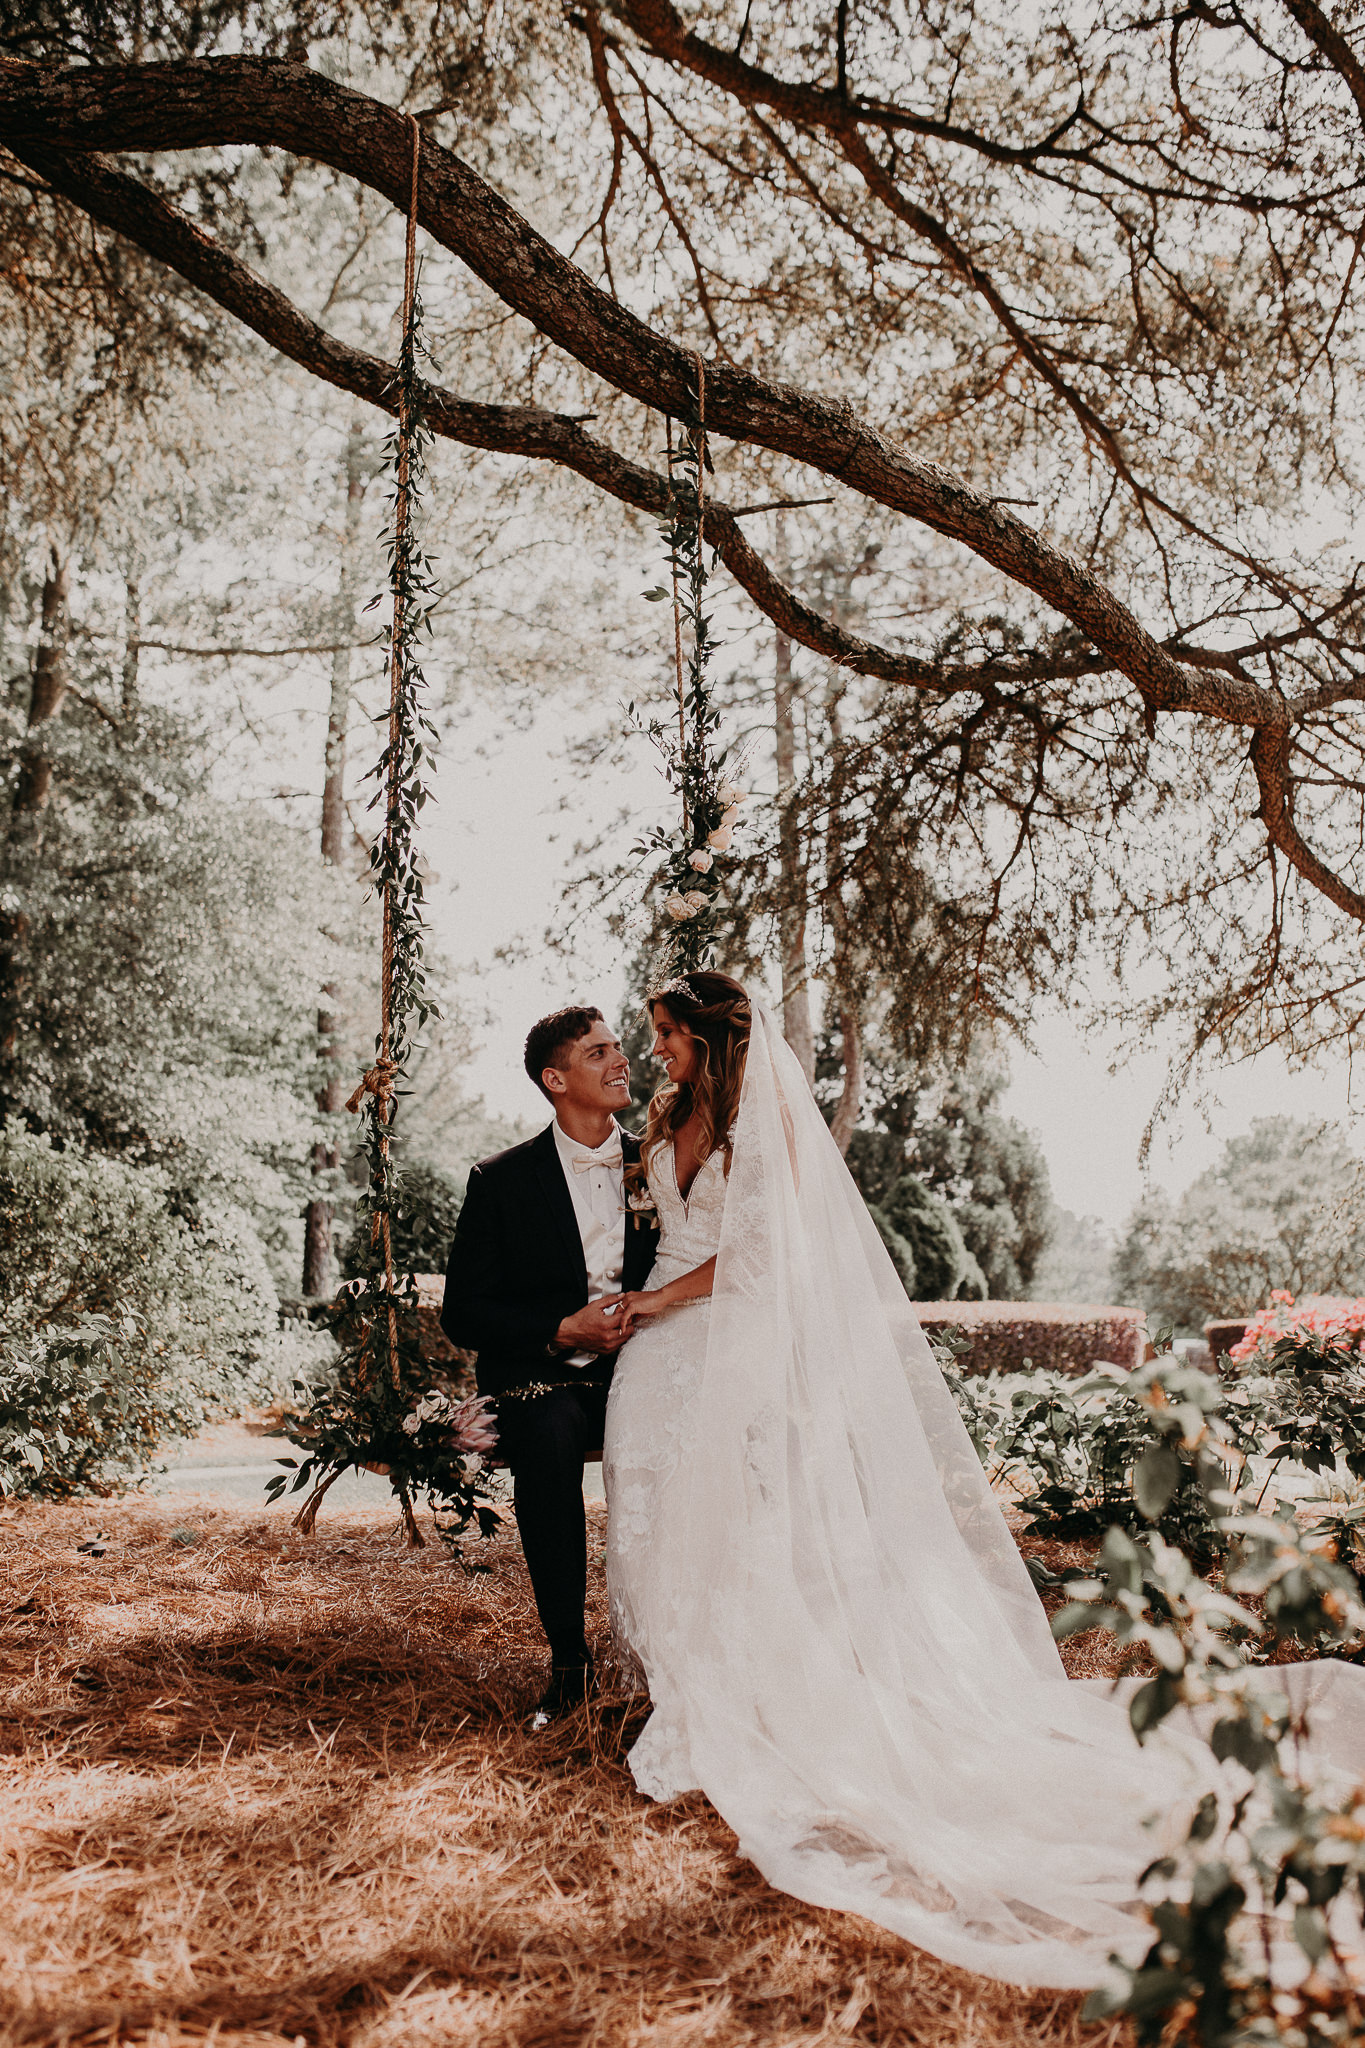 37 Carl House Wedding Venue Ga, Atlanta Wedding Photographer - Boho, Bohemian, Junebug Weddings, Vintage, Retro, Trendy. Aline Marin Photography._.JPG